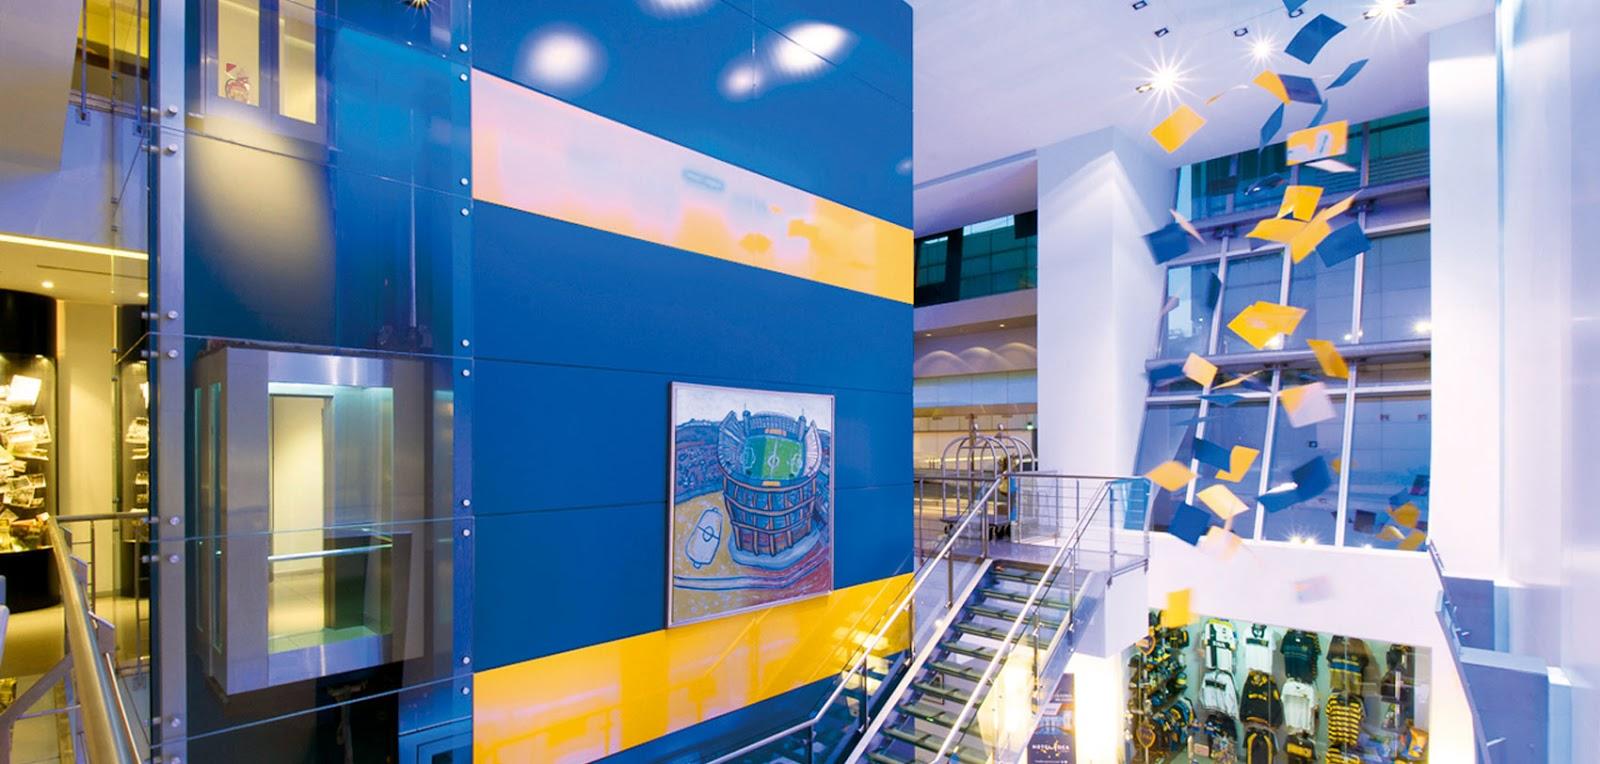 Los 5 hoteles m s futboleros del mundo viajabonito for Hotel design bs as